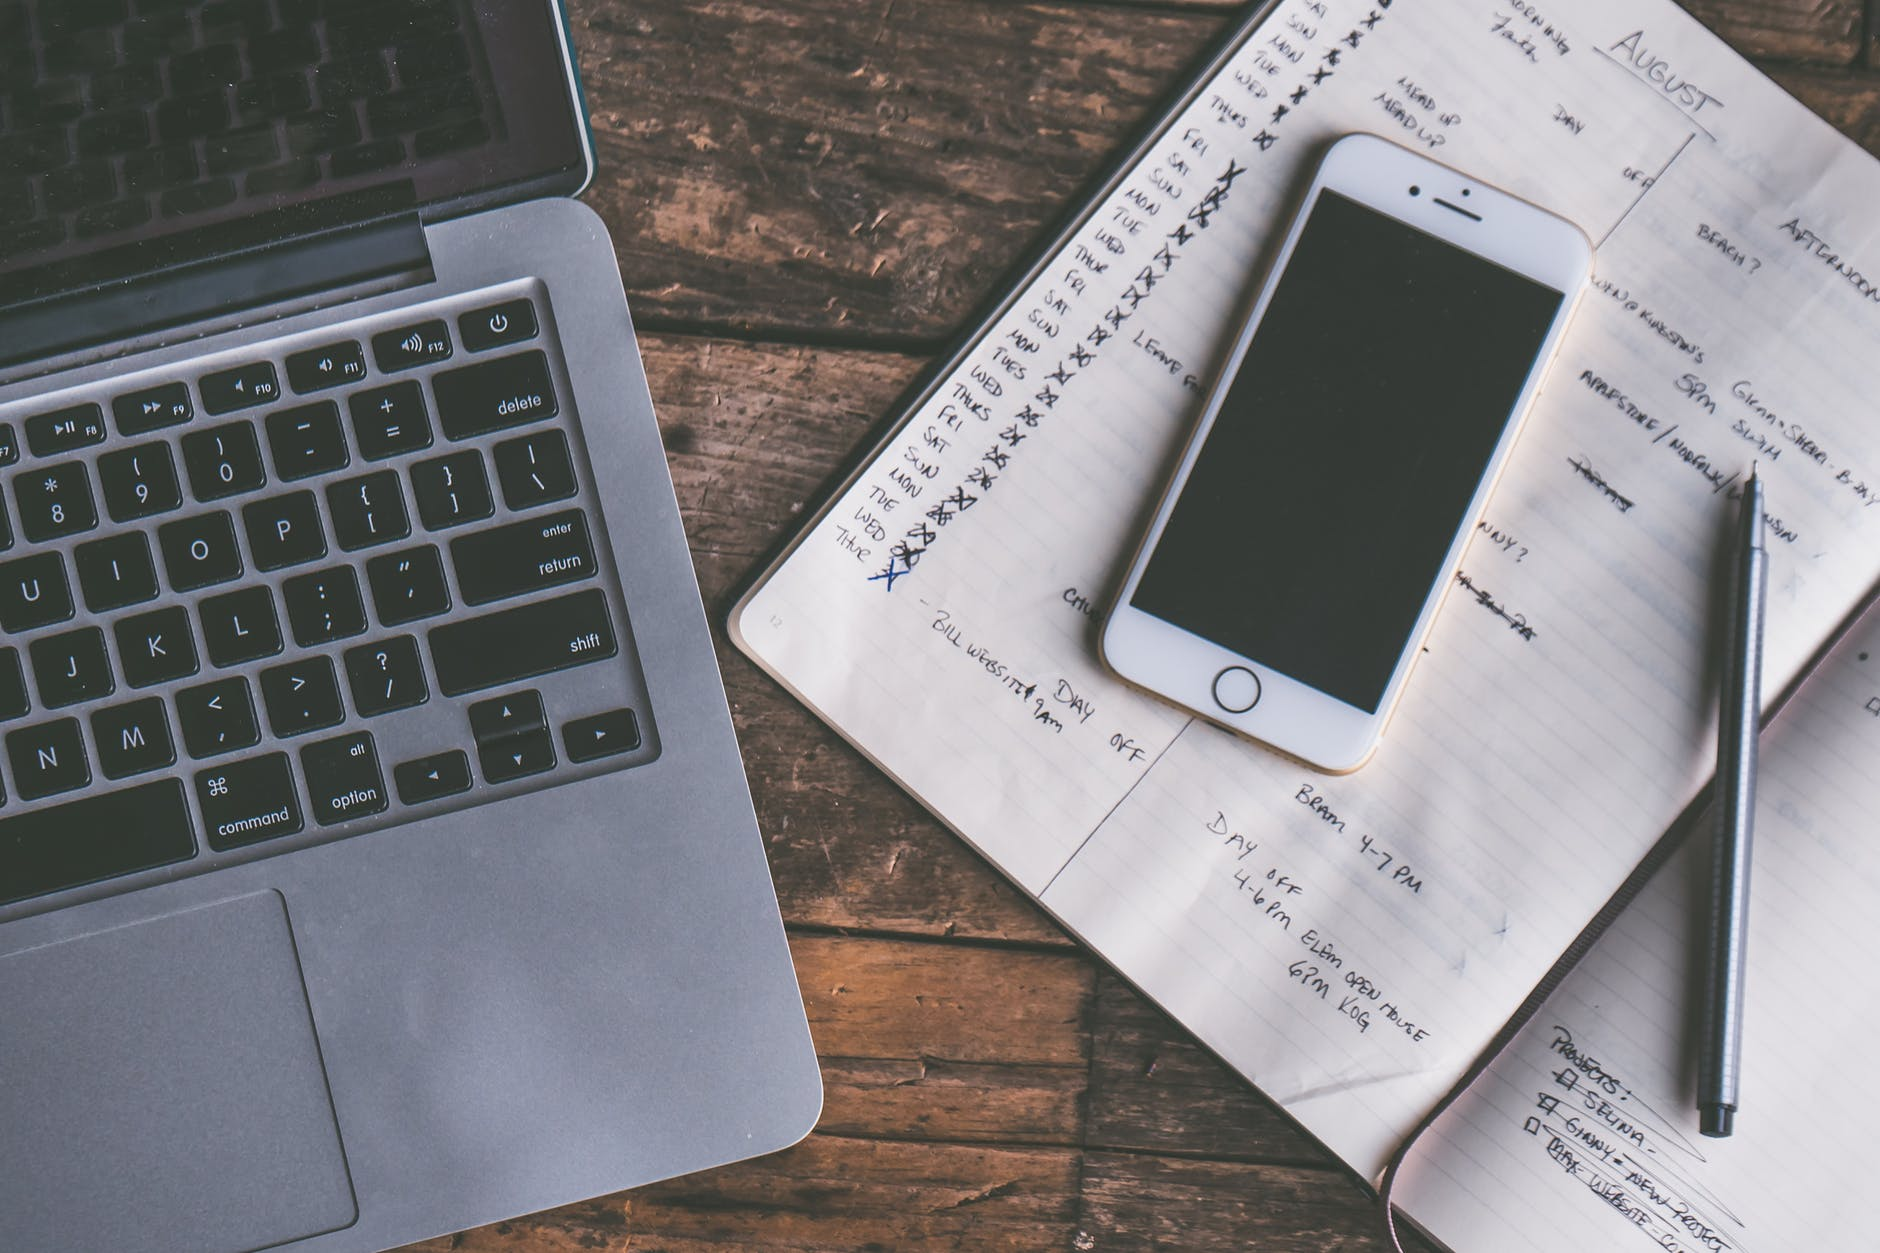 Questões Trabalhistas: Assinatura Digital tem Valor Jurídico?